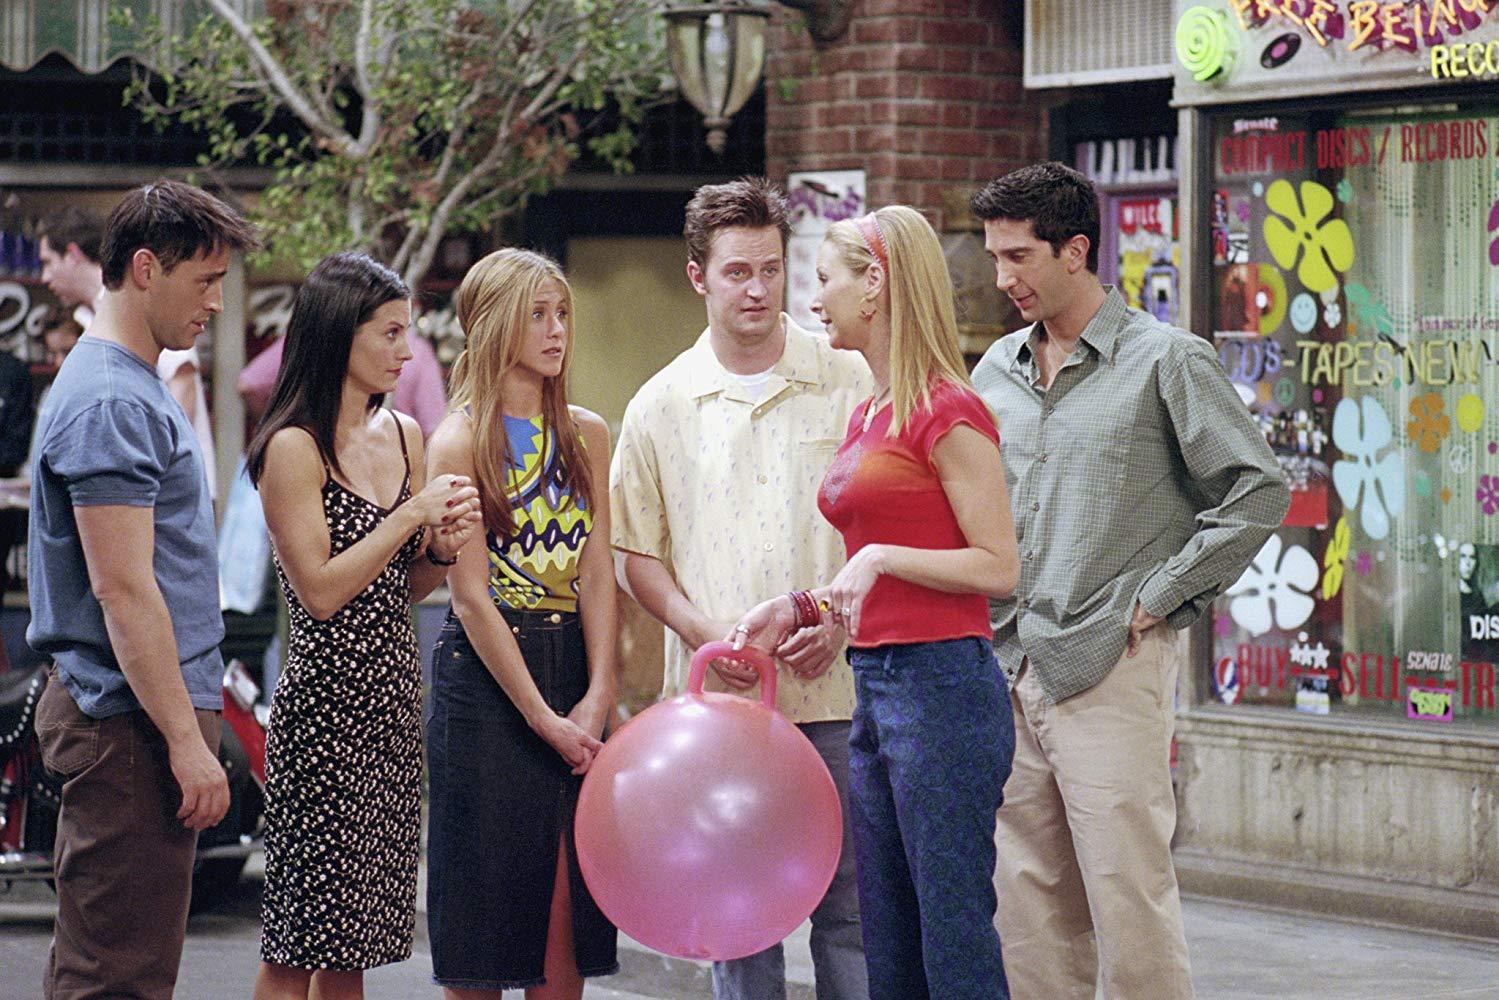 Matt LeBlanc, Courtney Cox, Jennifer Aniston, Matthew Perry, Lisa Kudrow, and David Schwimmer in Friends